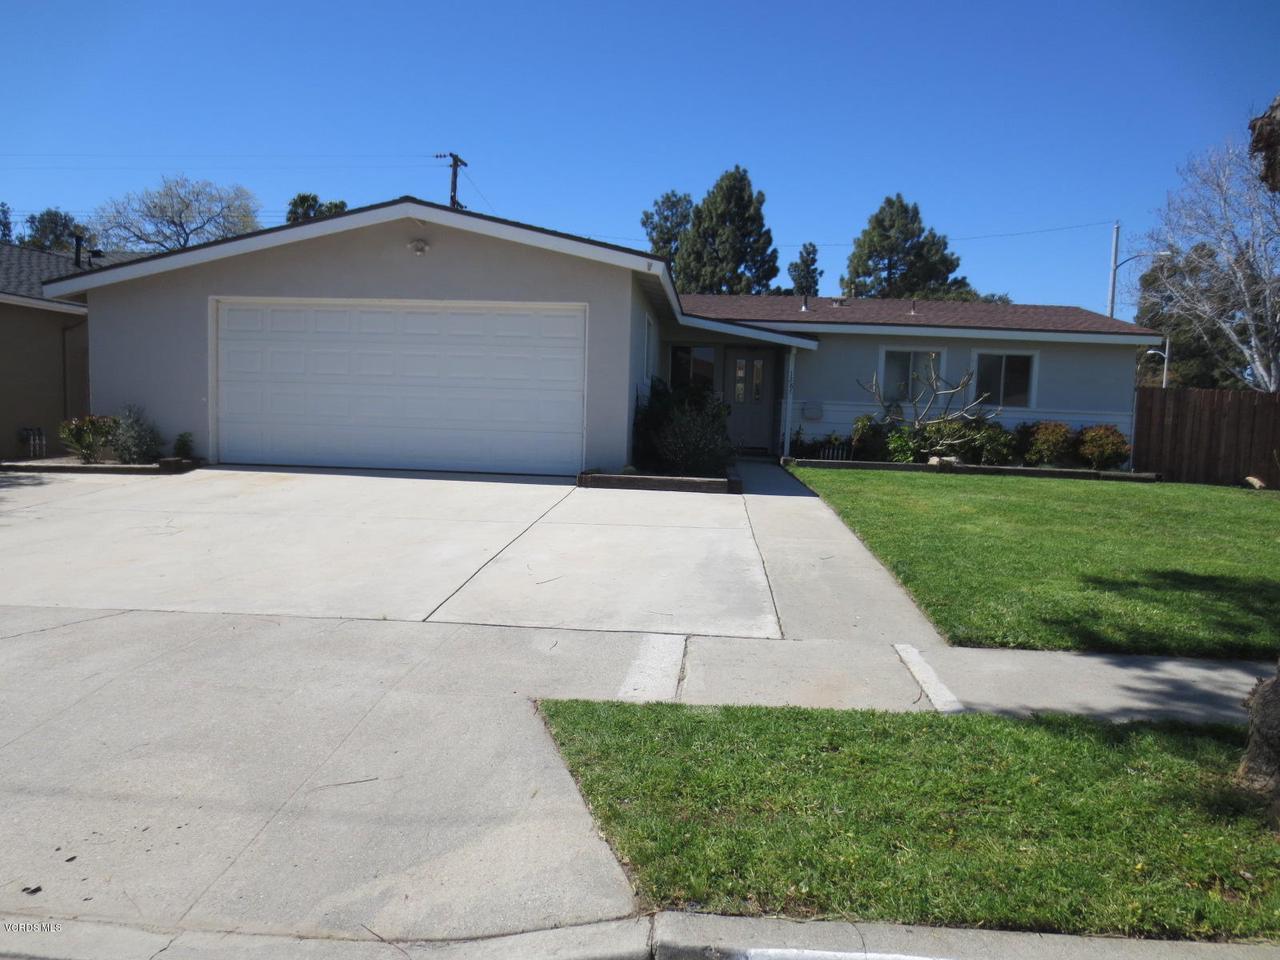 1287 DURKIN, Camarillo, CA 93010 - IMG_2547